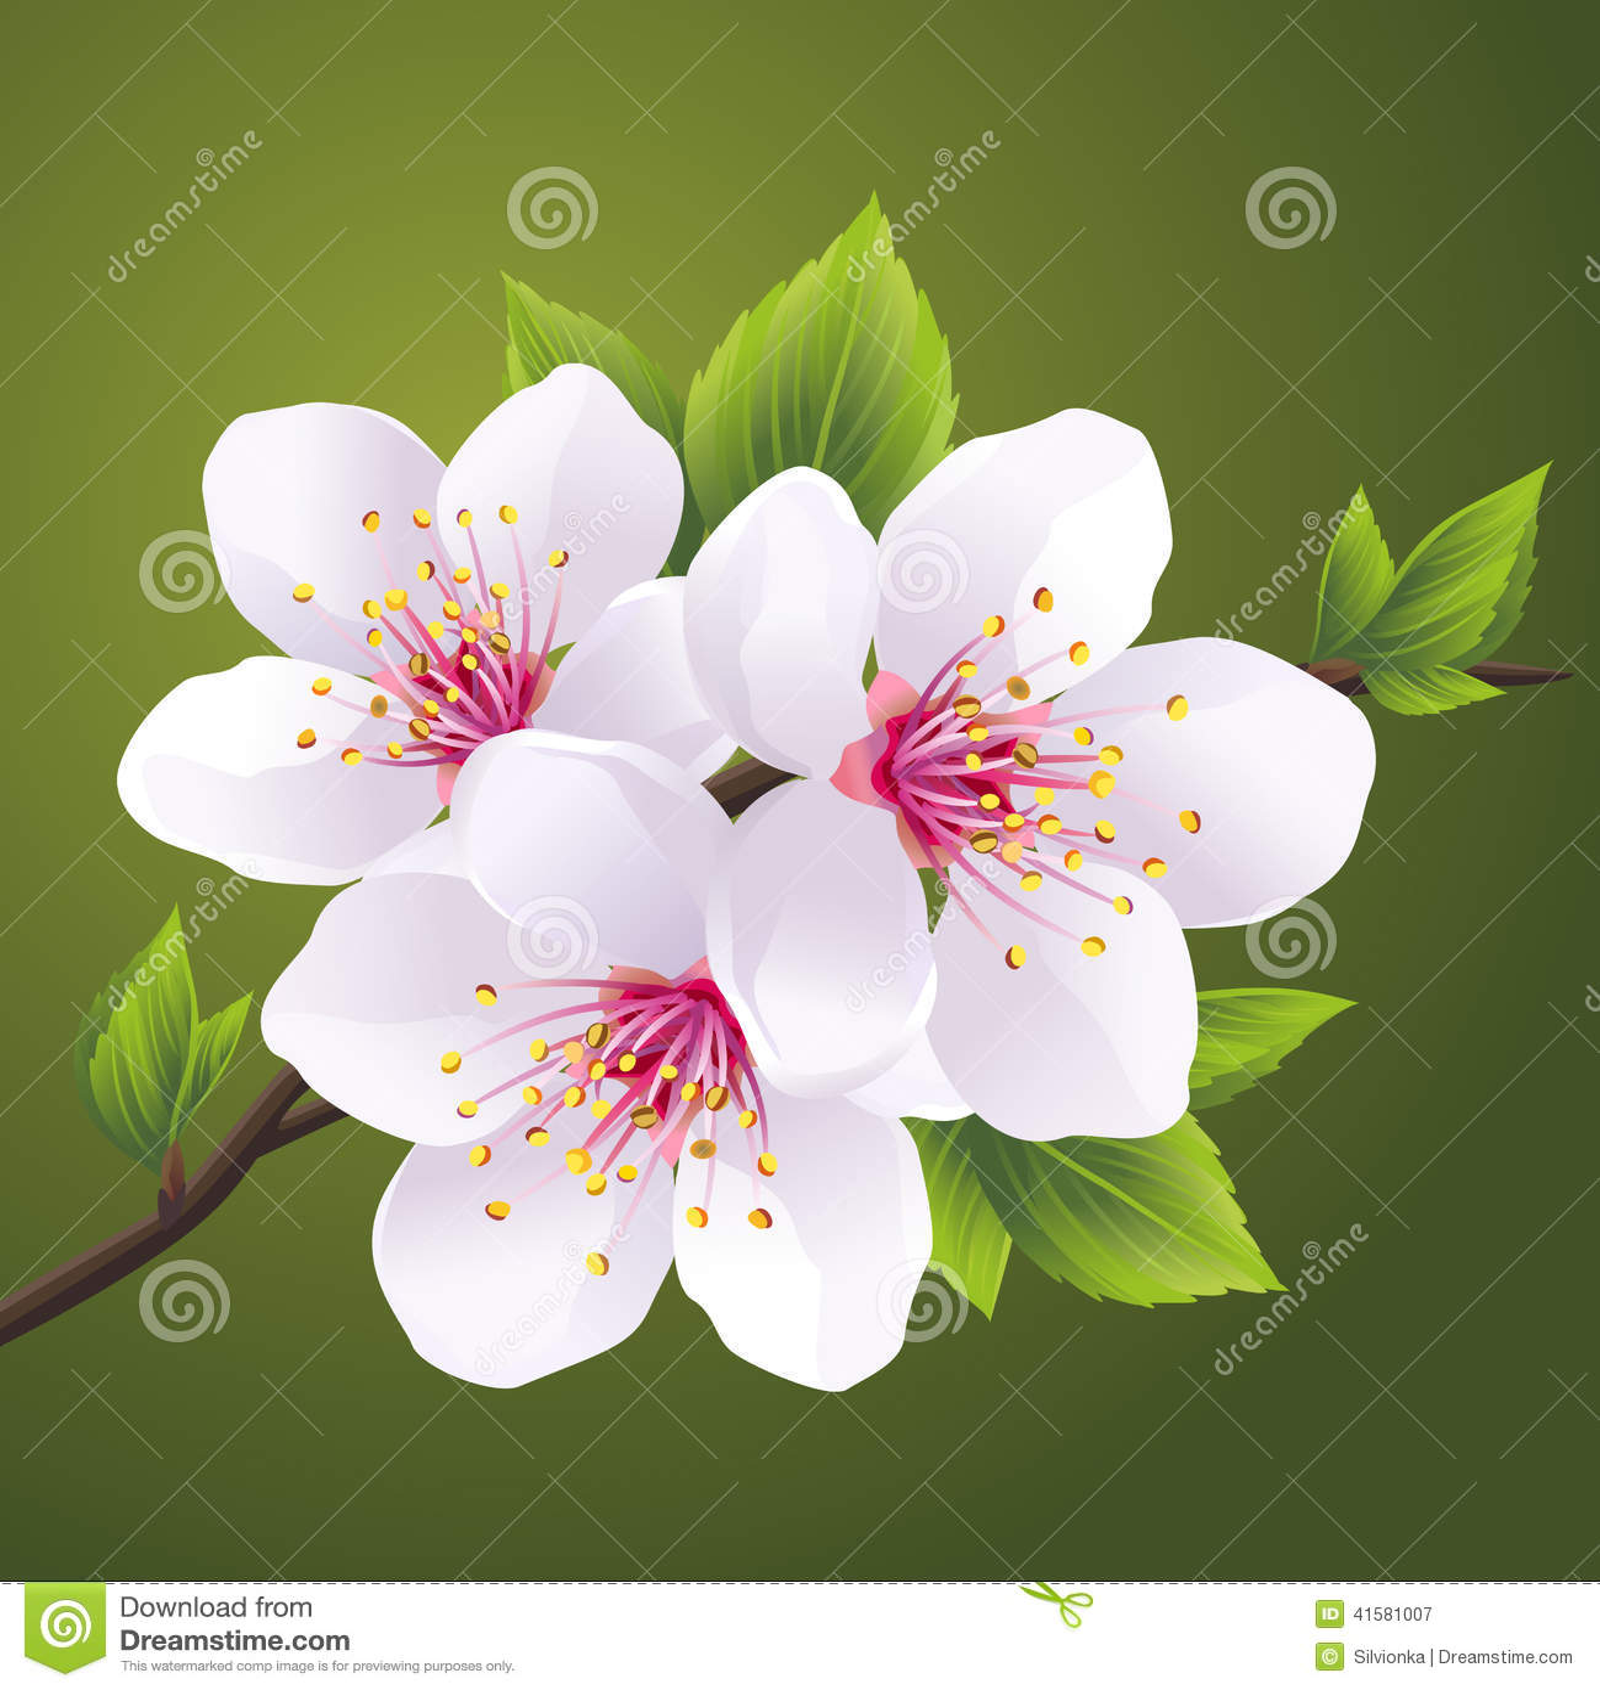 Branche se d veloppante de sakura cerisier illustration - Branche de cerisier japonais ...